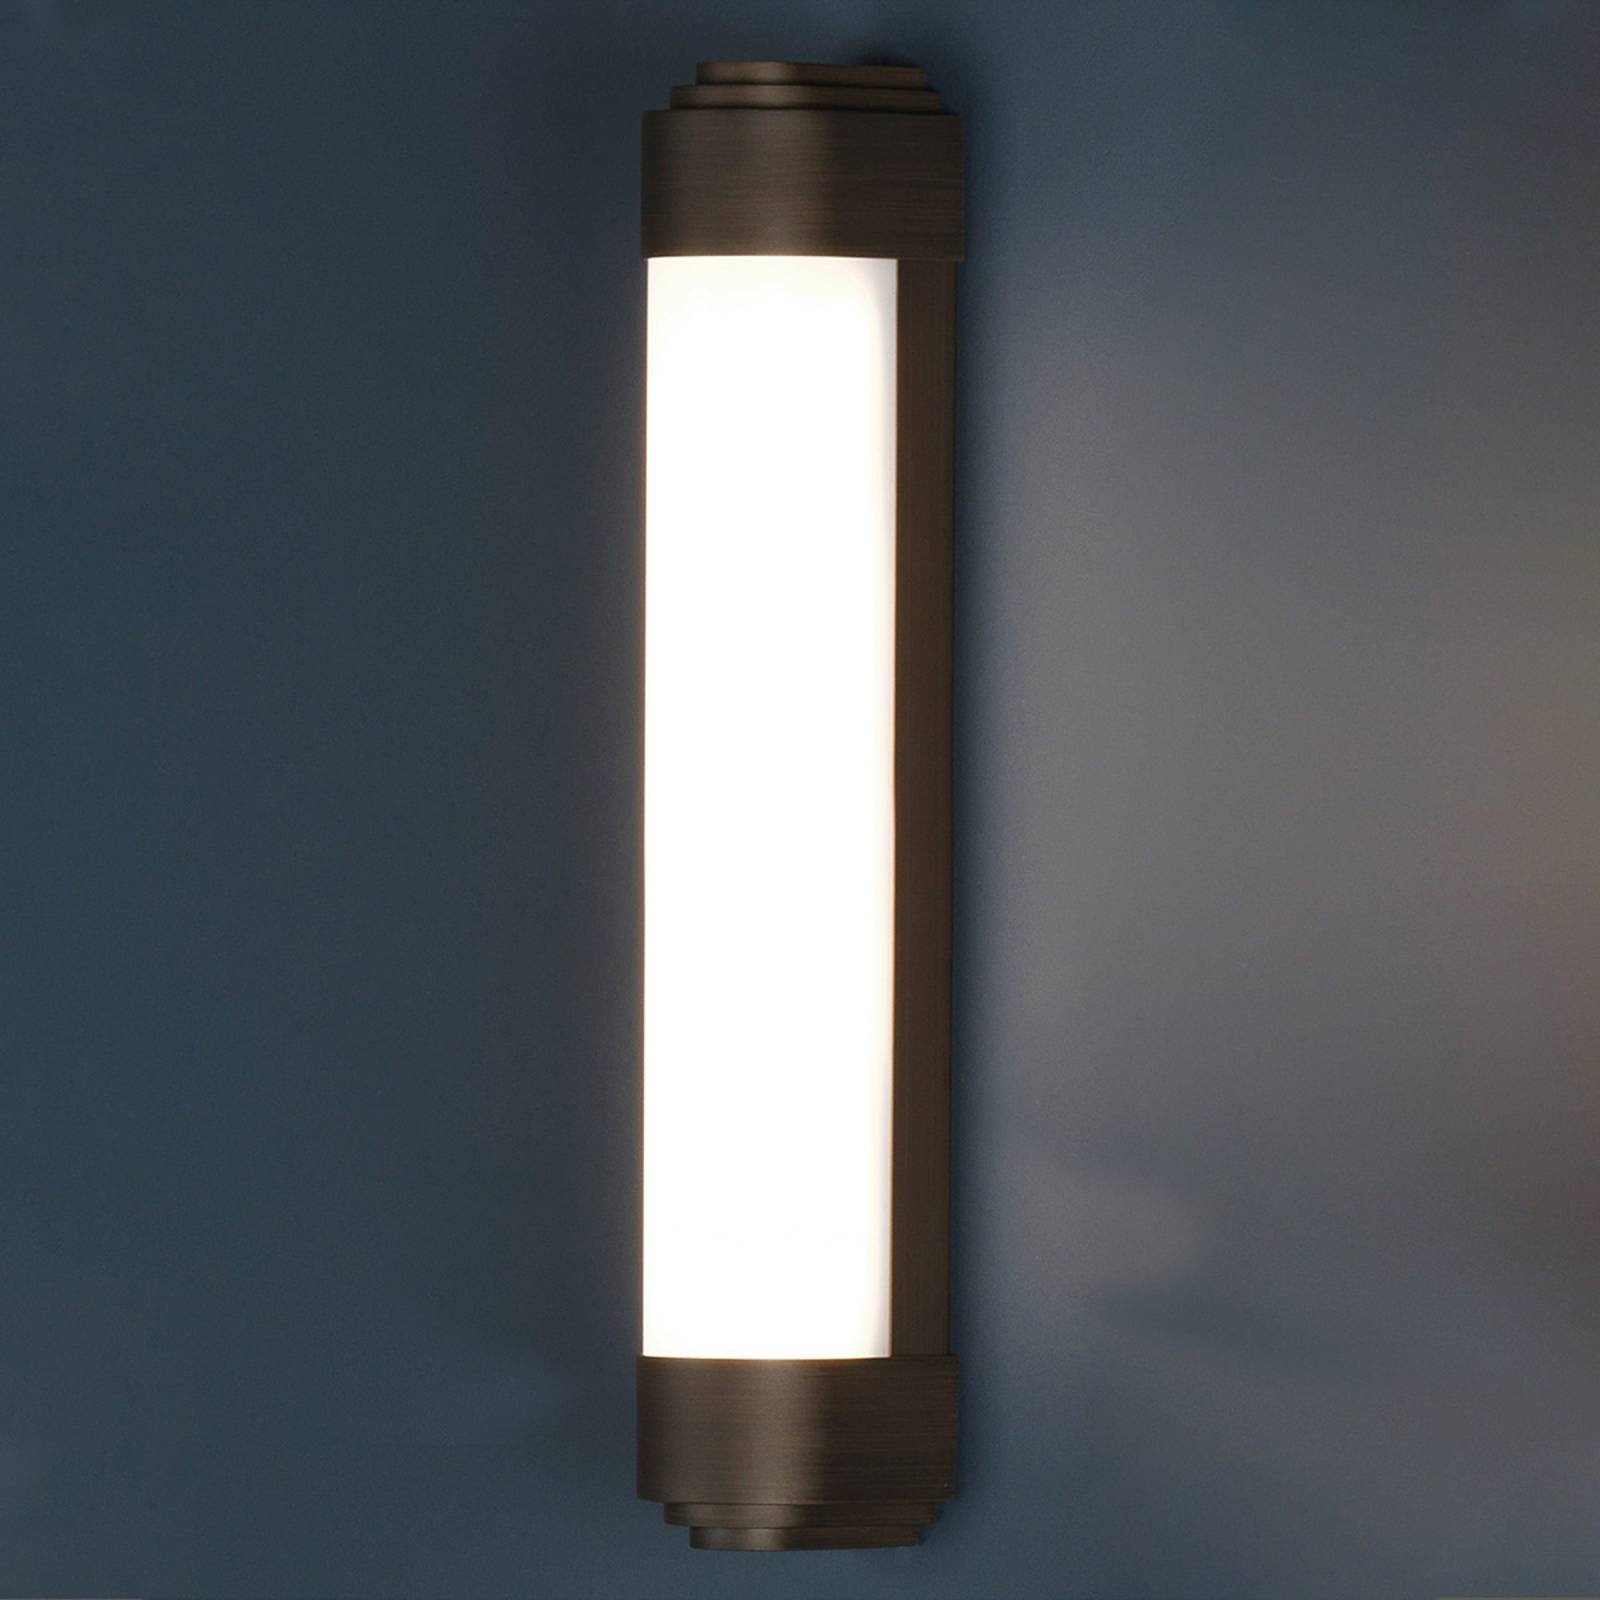 Astro Belgravia -LED-seinävalaisin, 60 cm